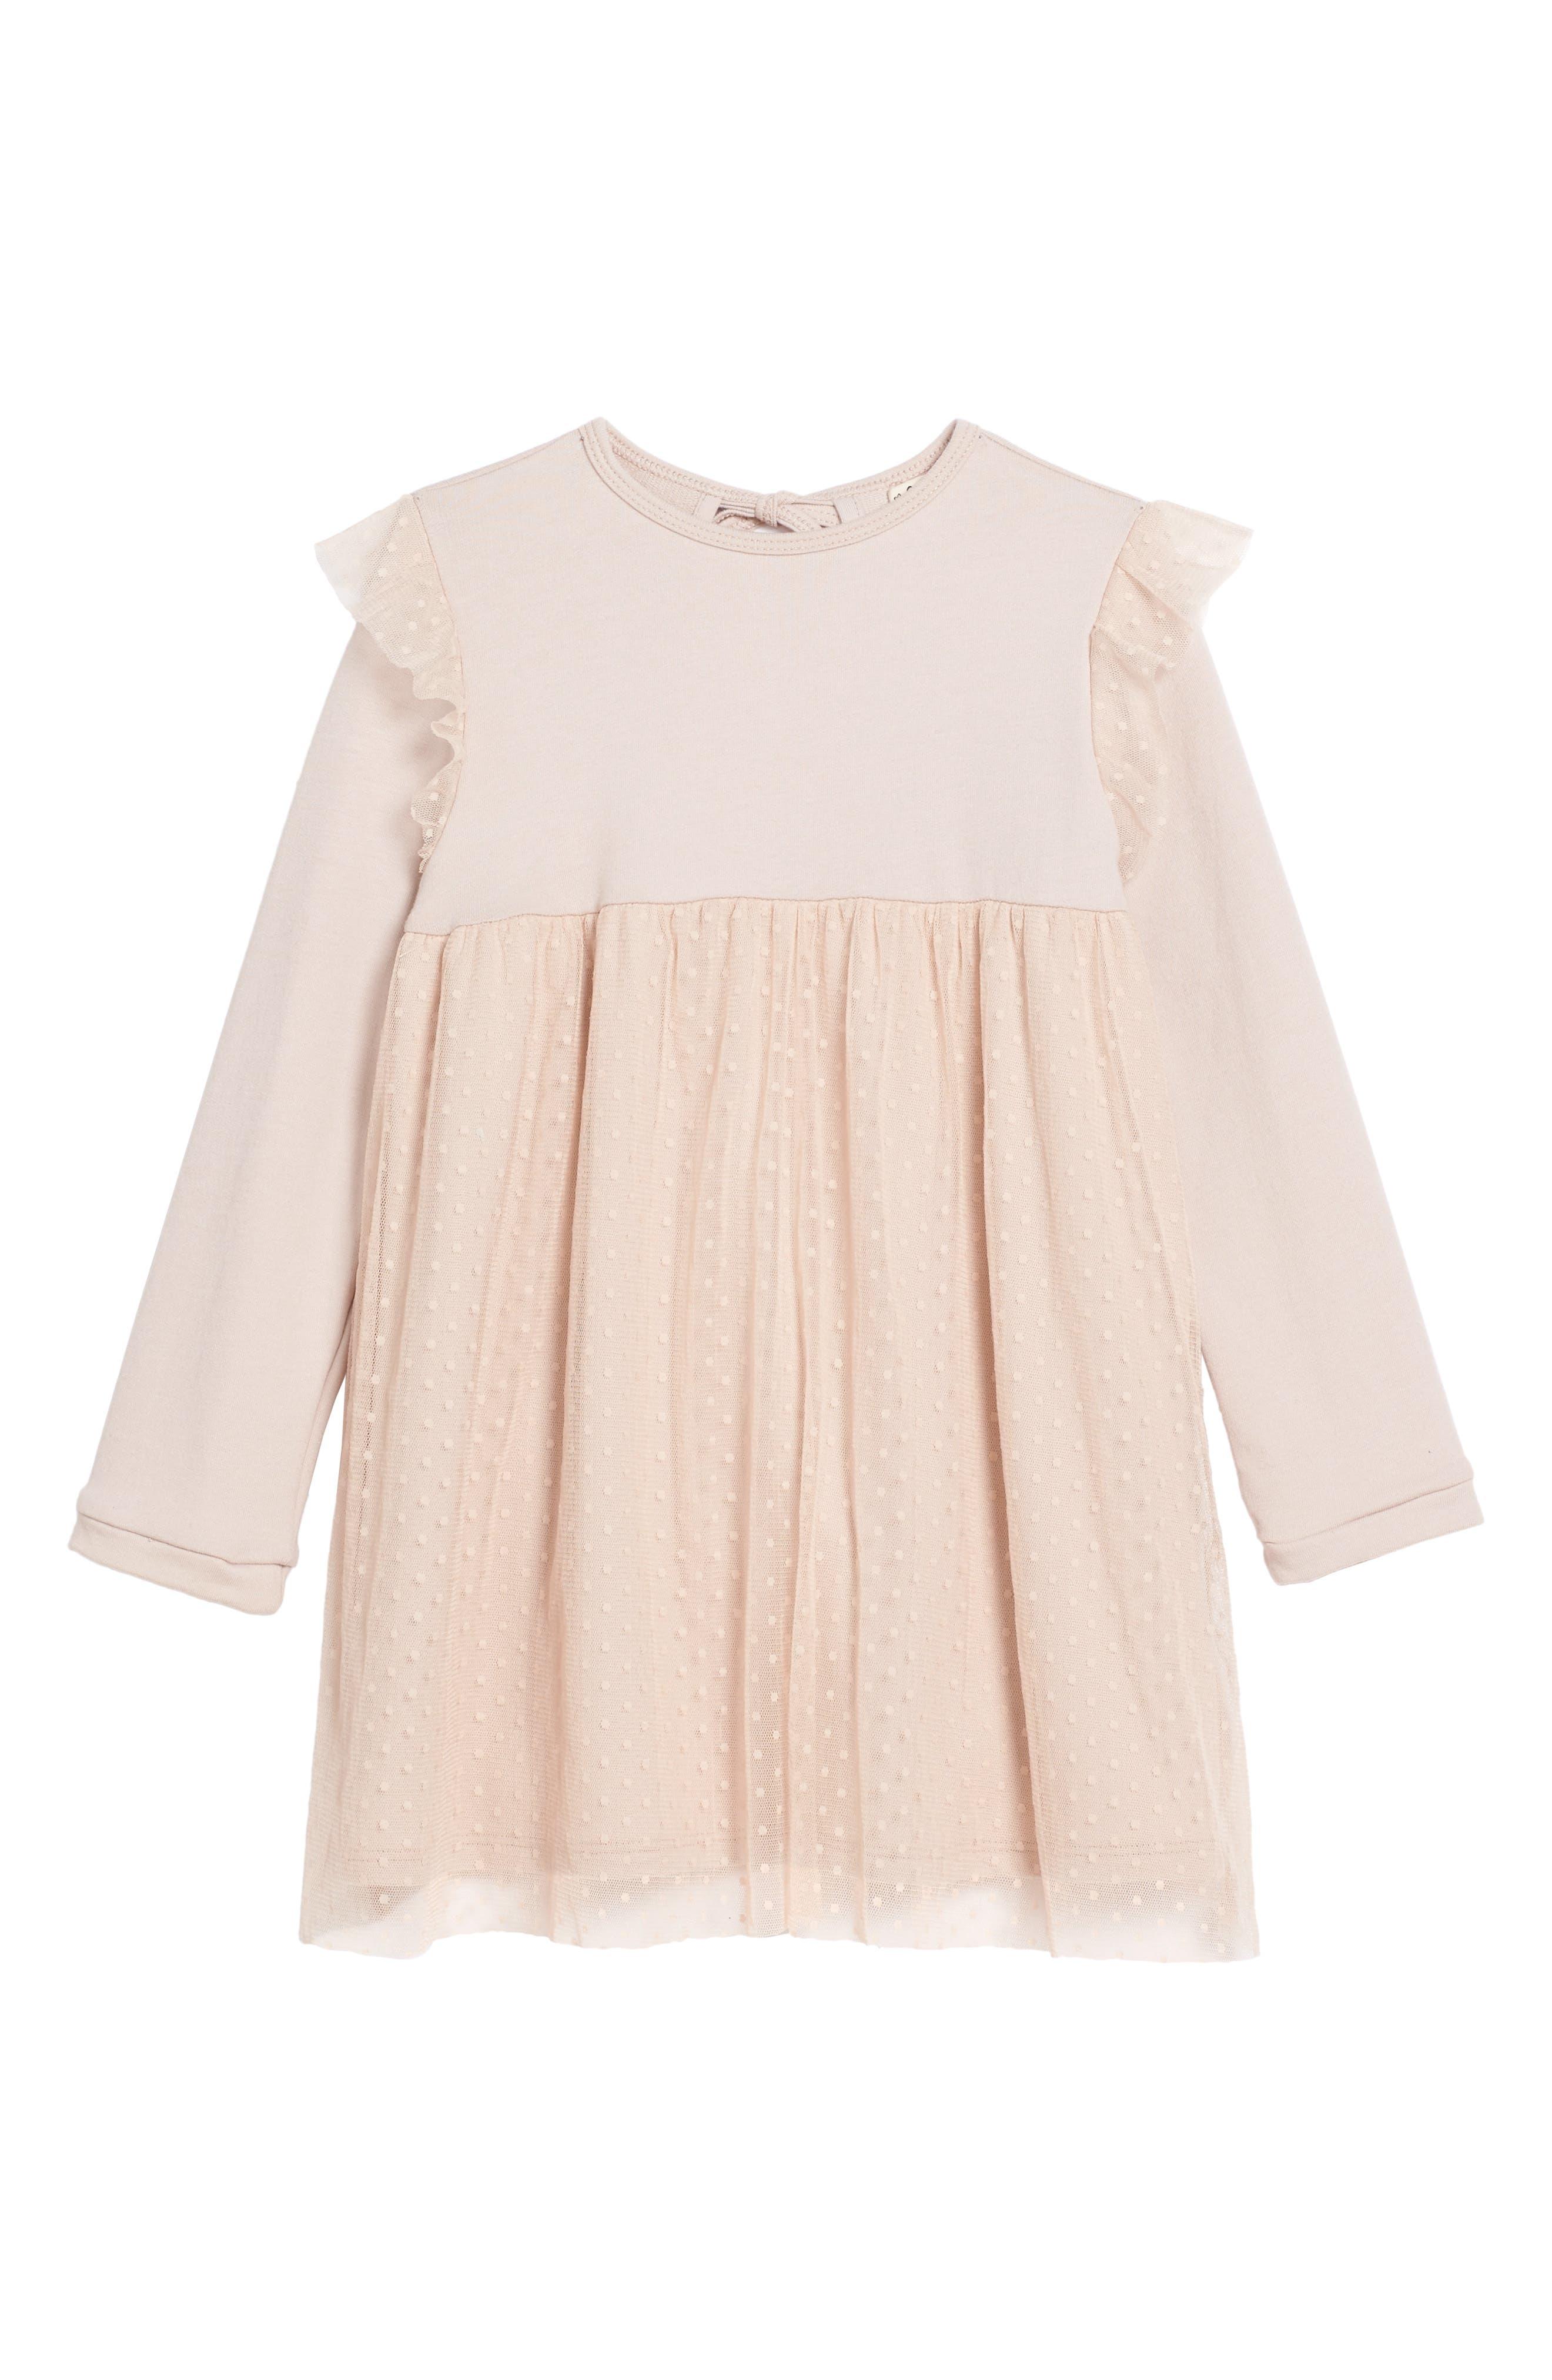 Ballerina Tulle Dress,                         Main,                         color, Misty Rose